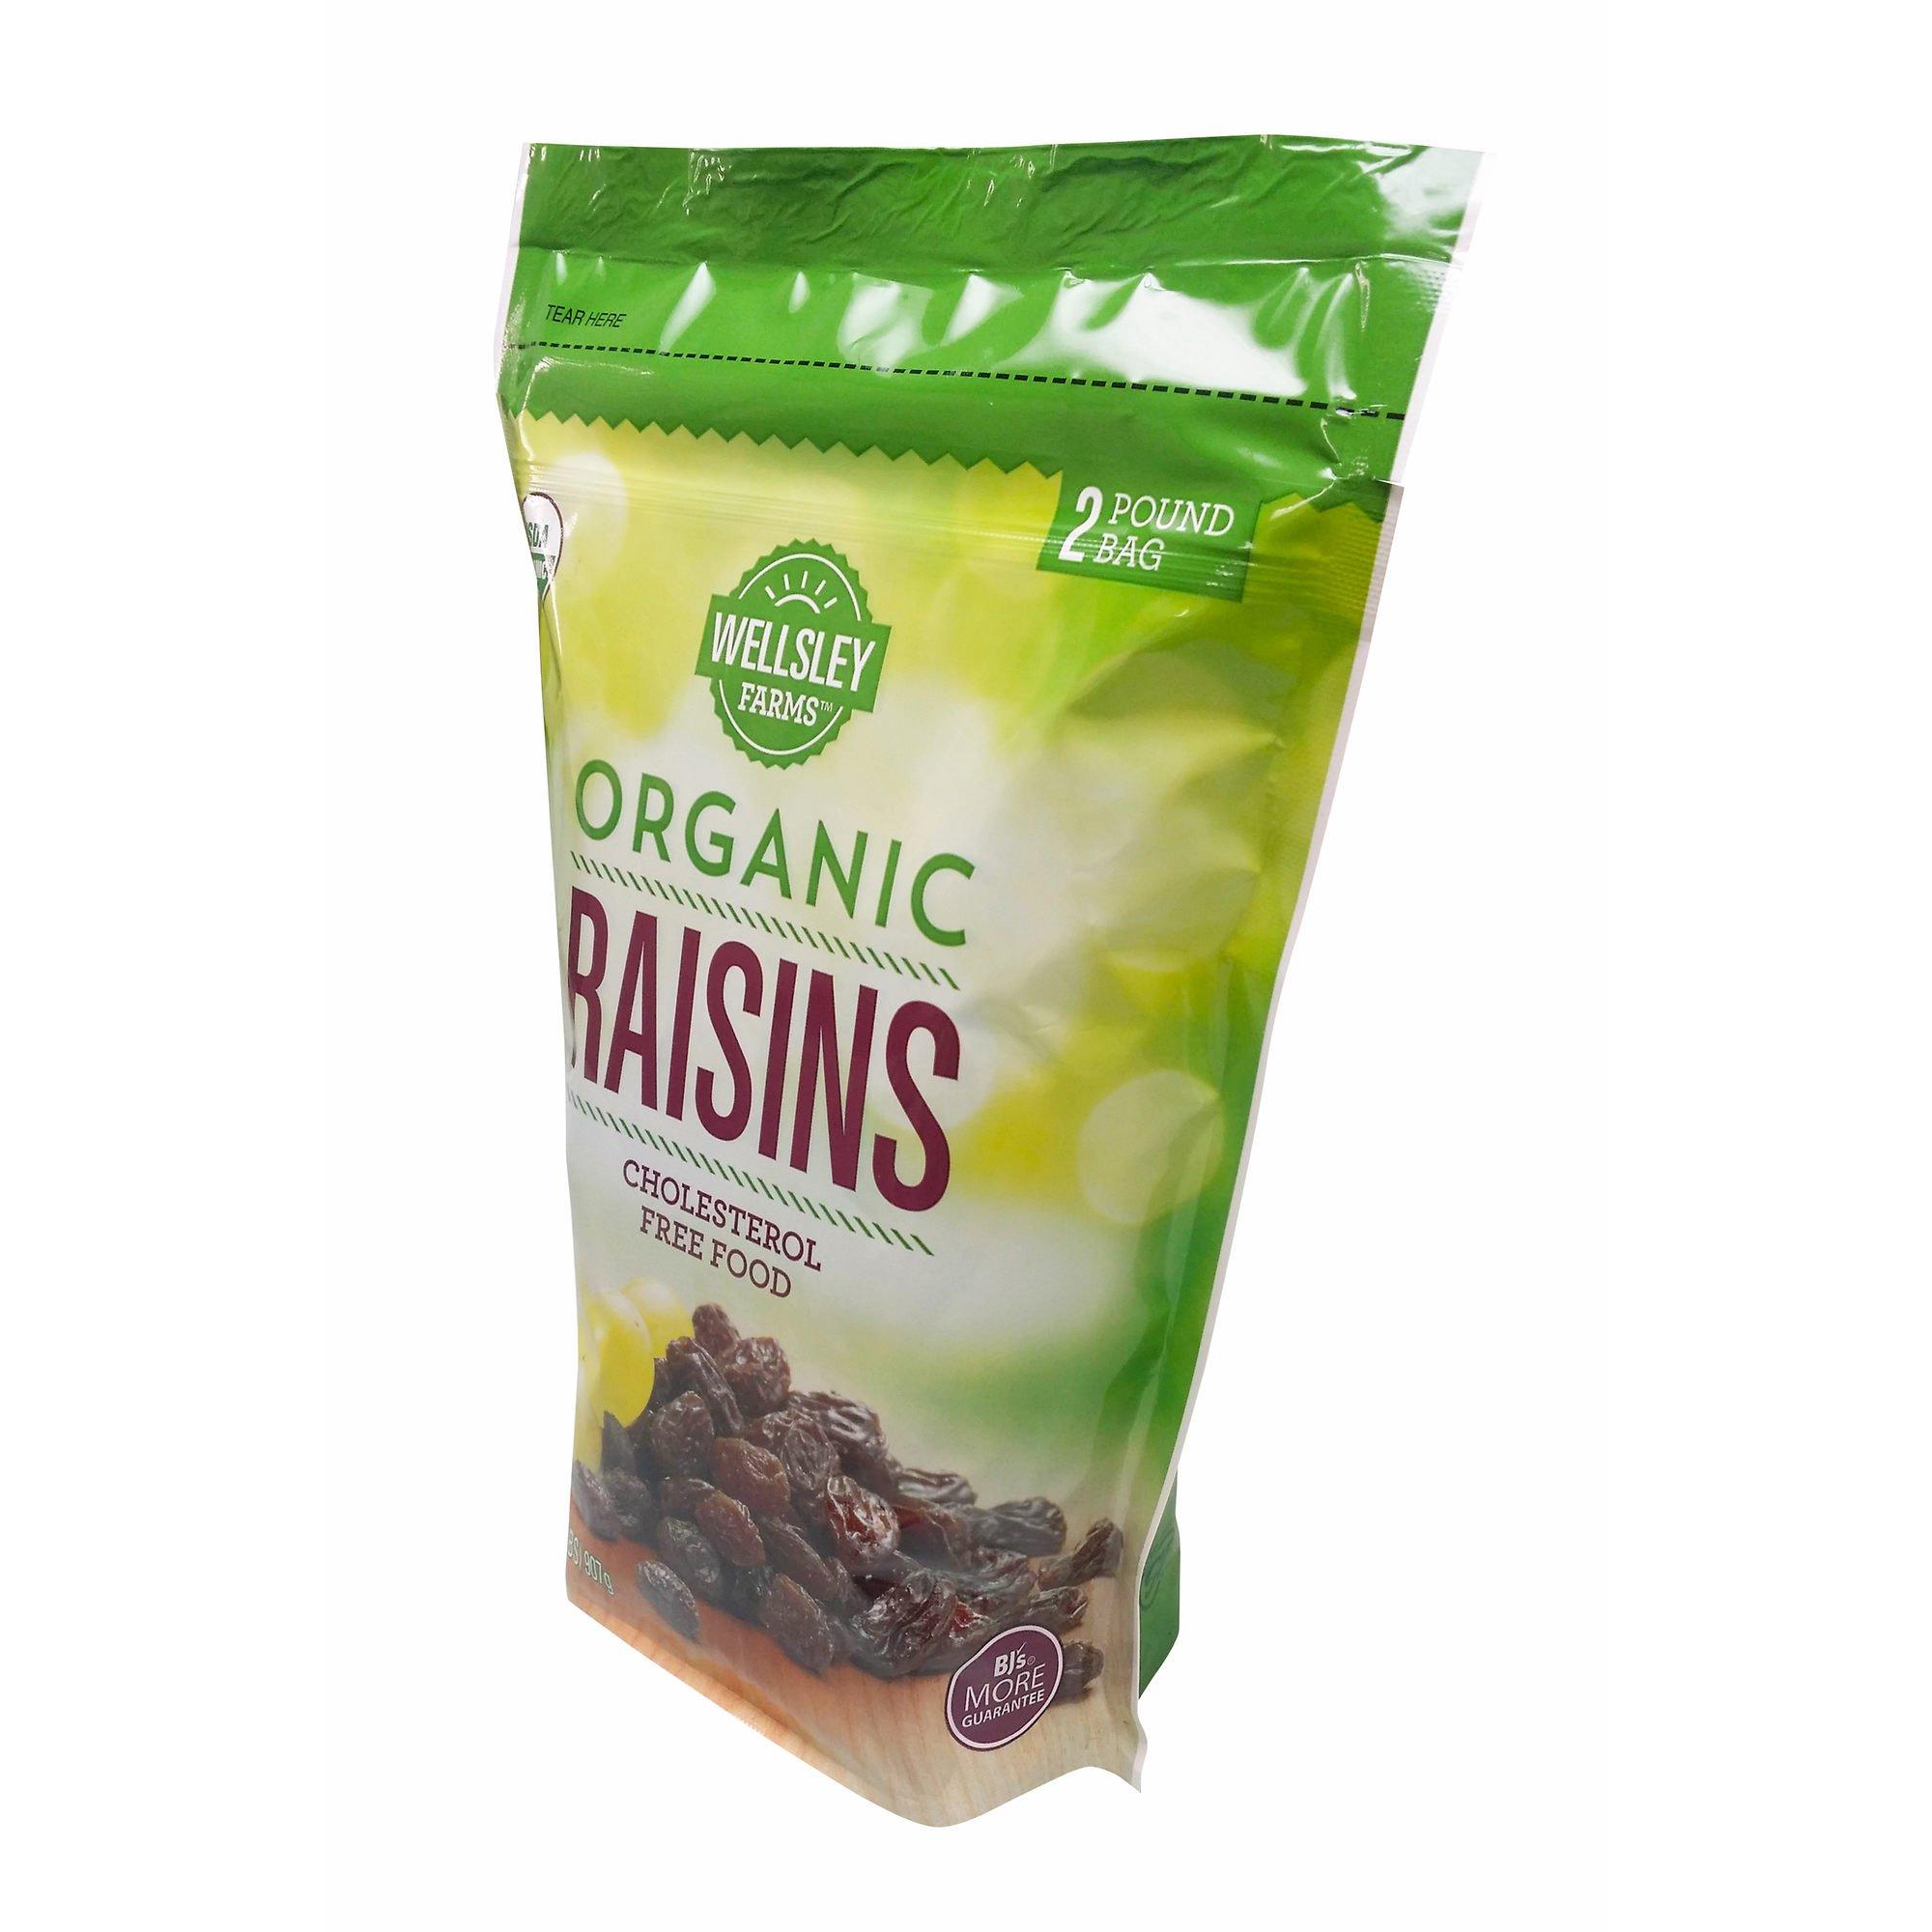 Wellsley Farms Organic Raisins, 2 lb.